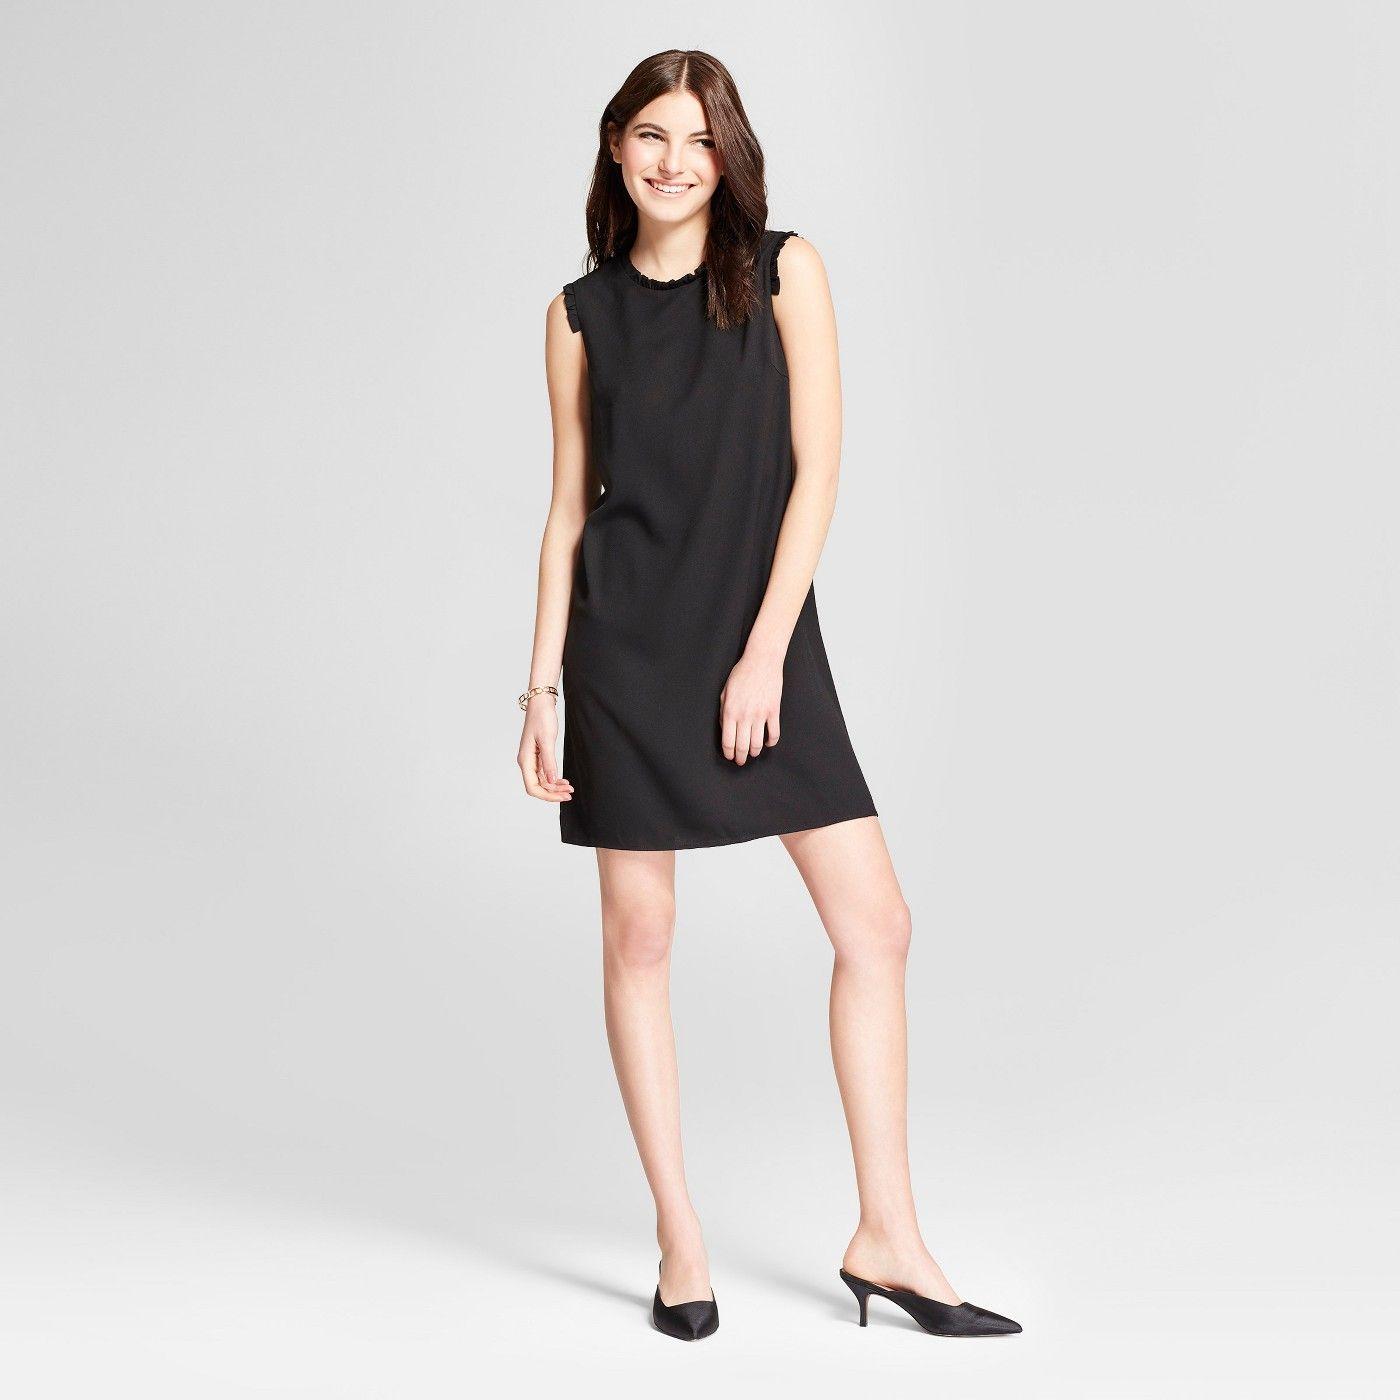 Gothic Fashion At Target Yes You Can Shop Goth At Target Mini Shift Dress Mini Black Dress Dresses [ 1400 x 1400 Pixel ]